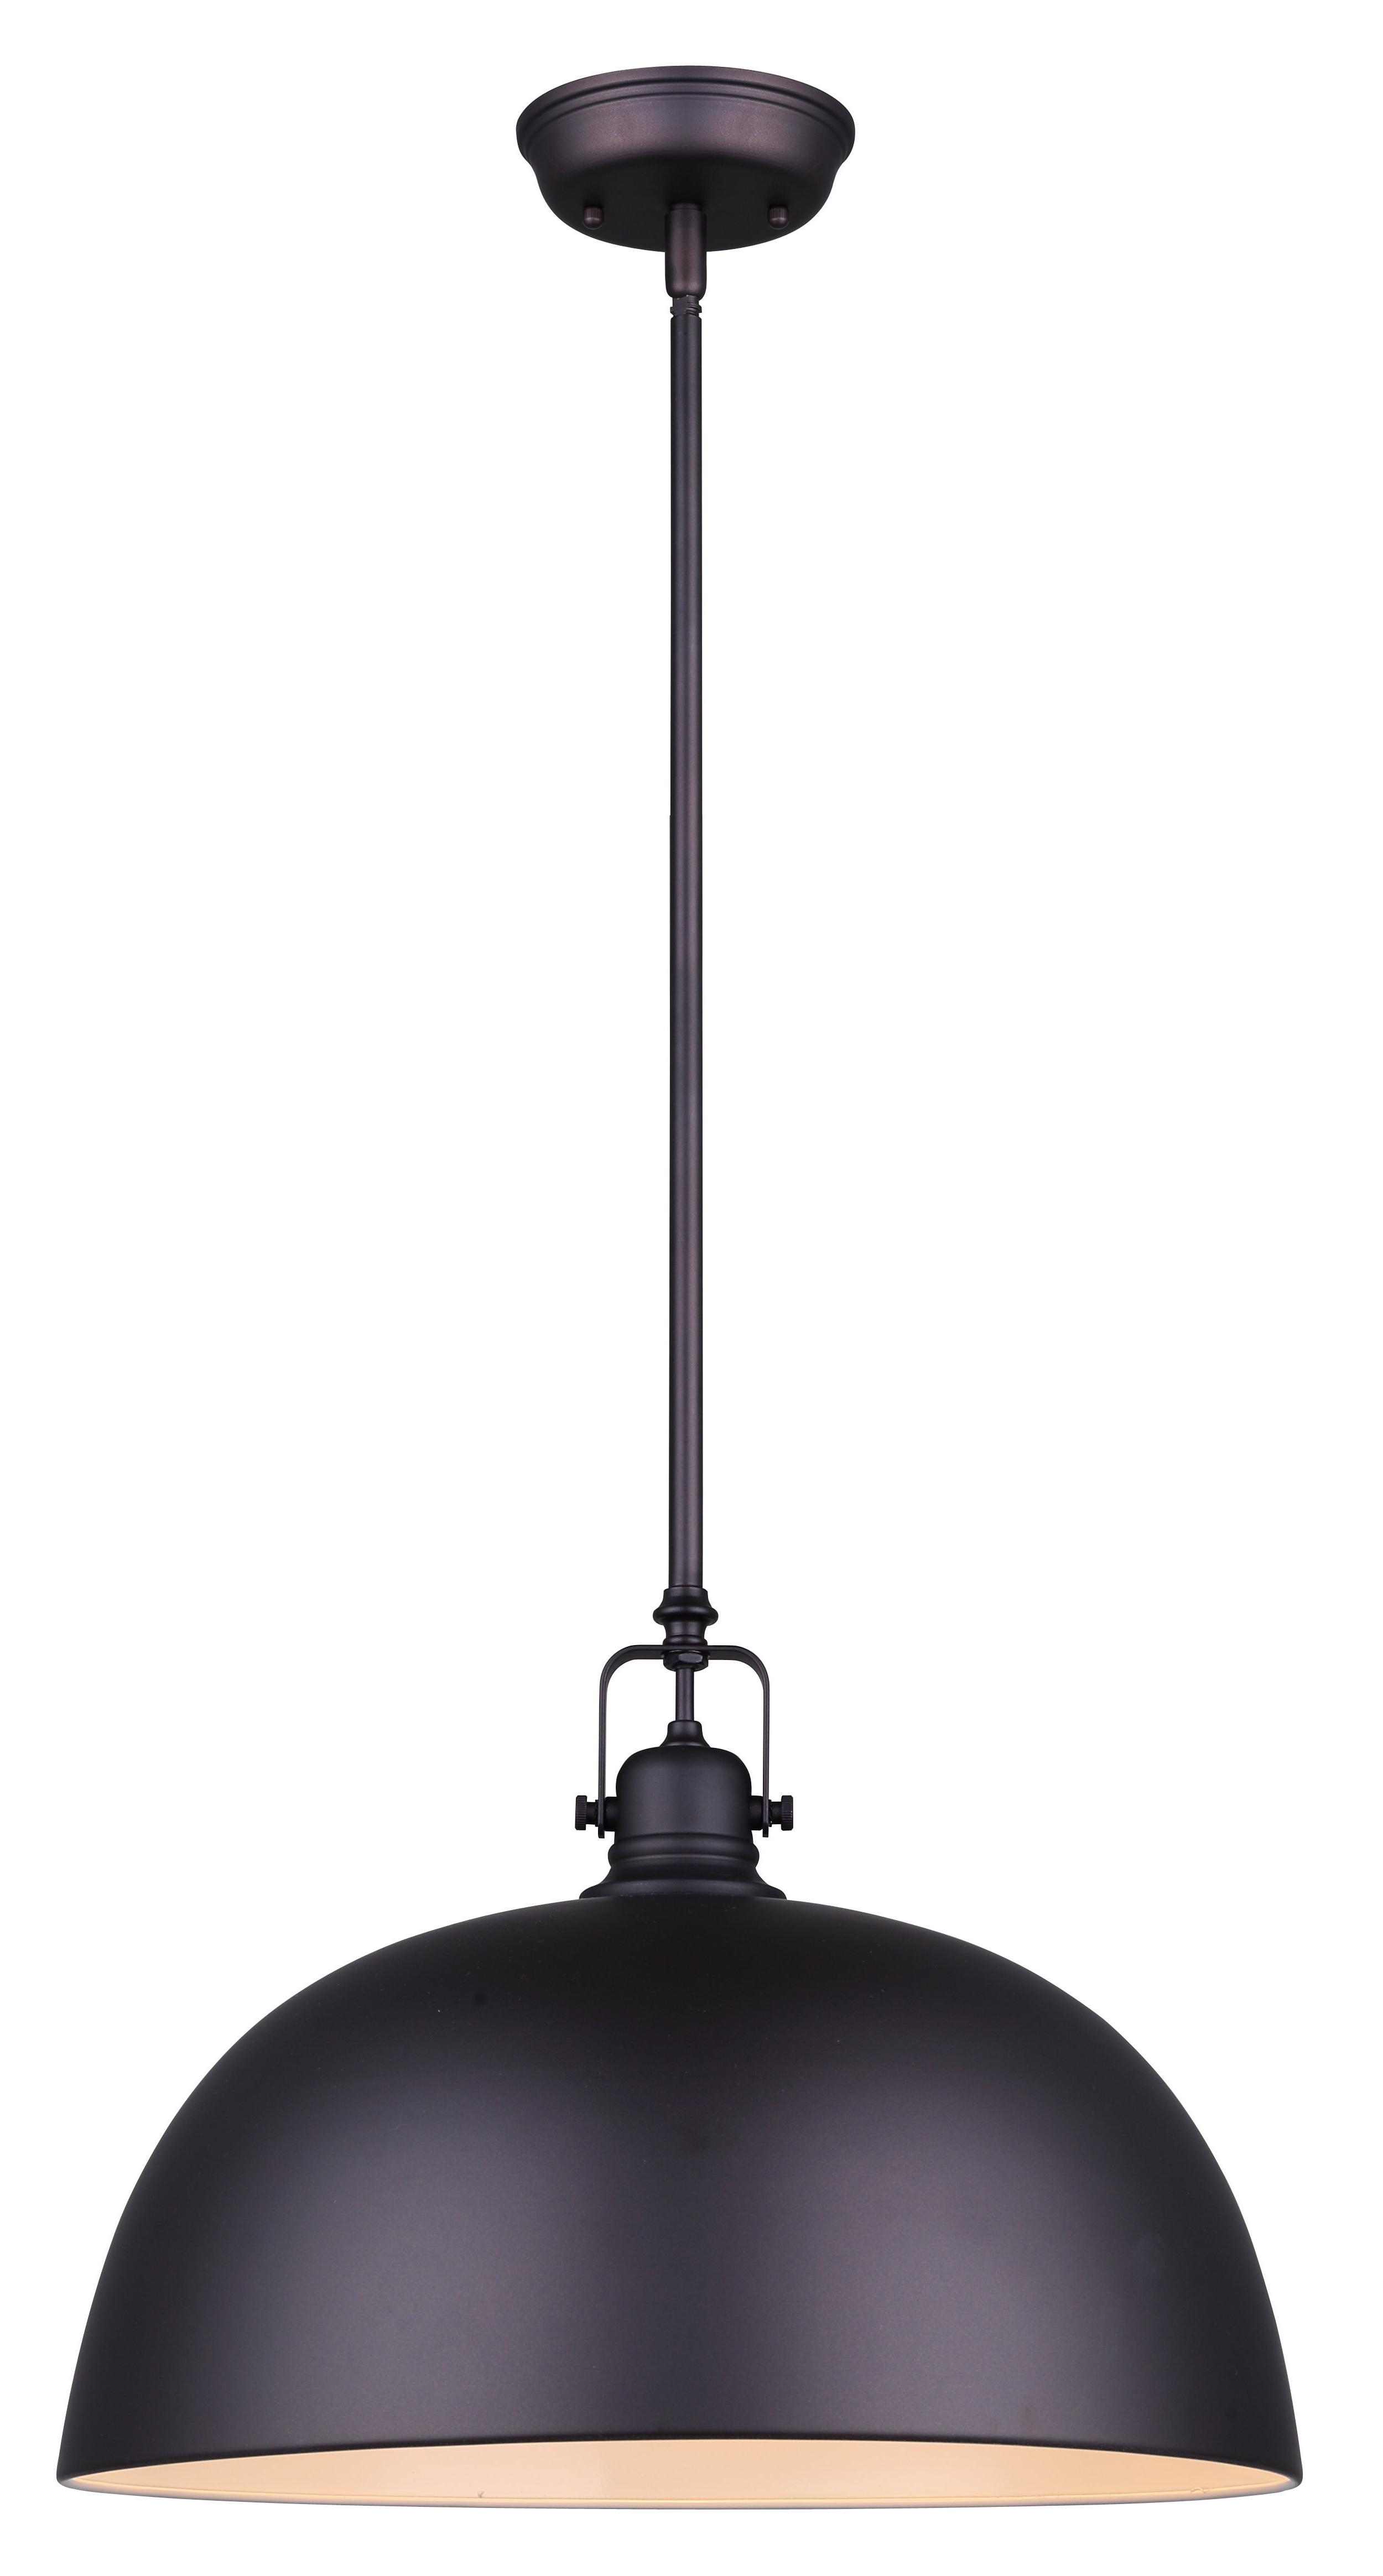 2020 Abernathy 1 Light Dome Pendants For Southlake 1 Light Single Dome Pendant (View 2 of 20)